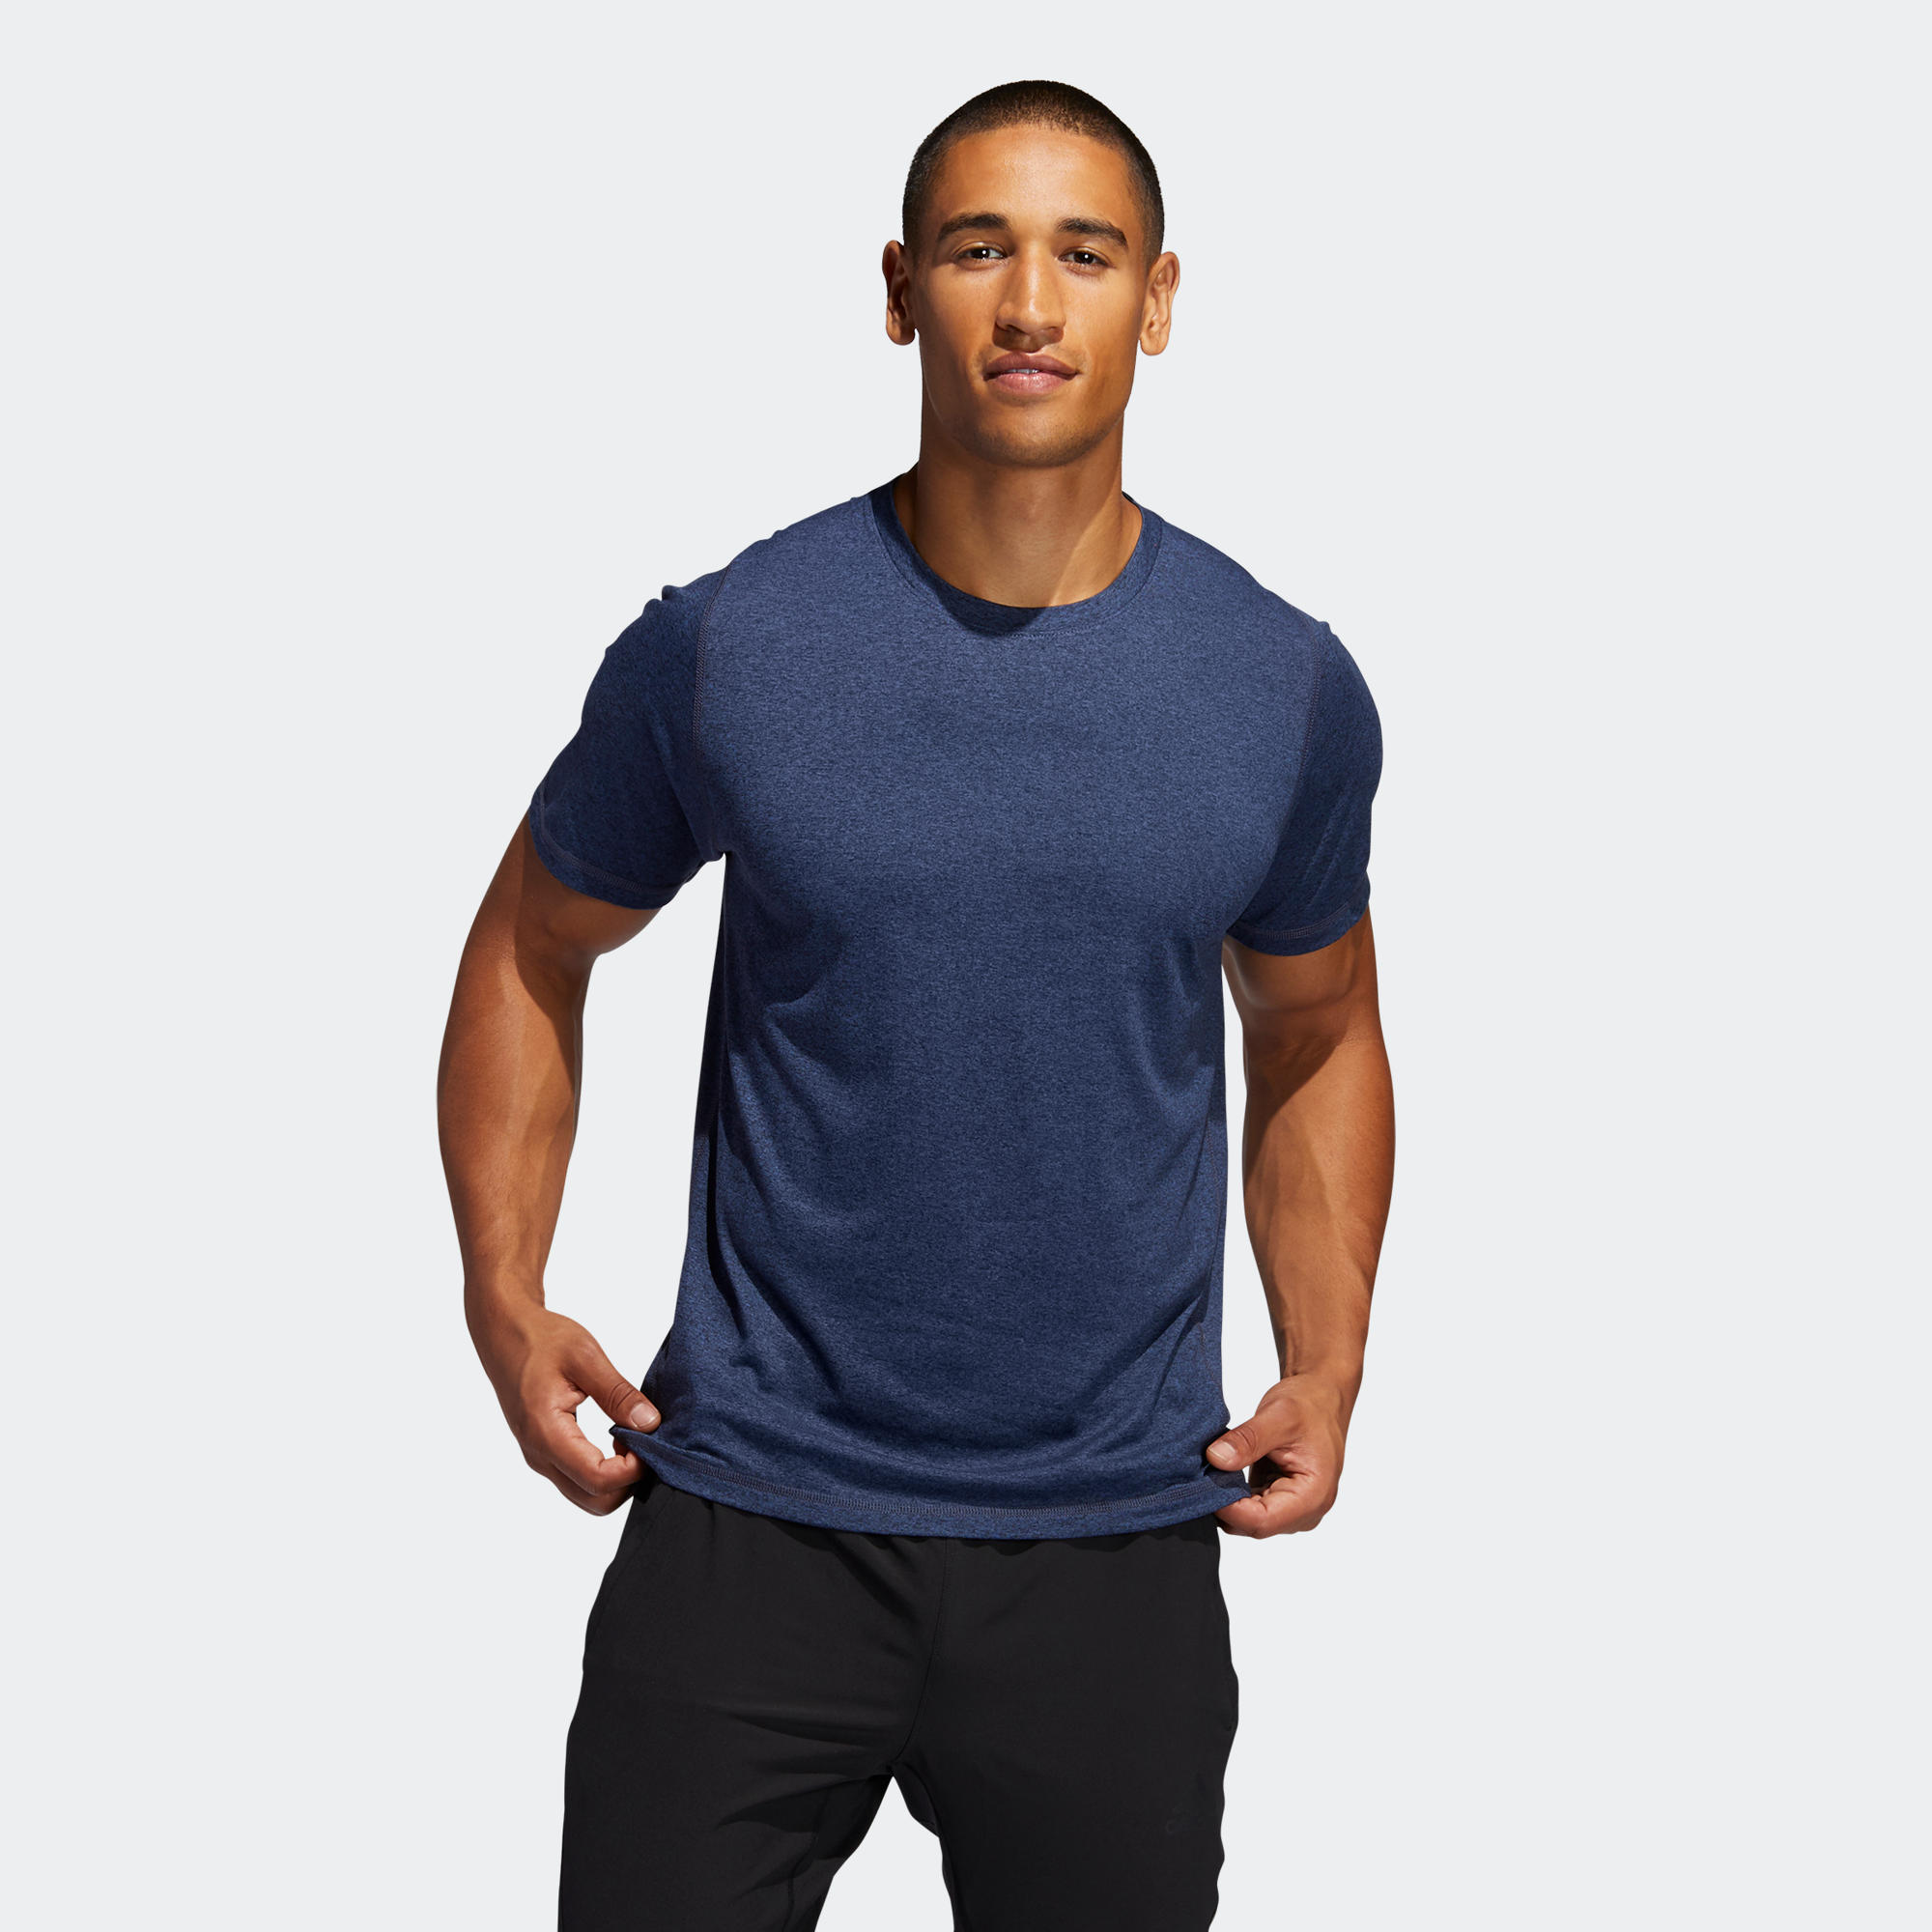 adidas shirt homme